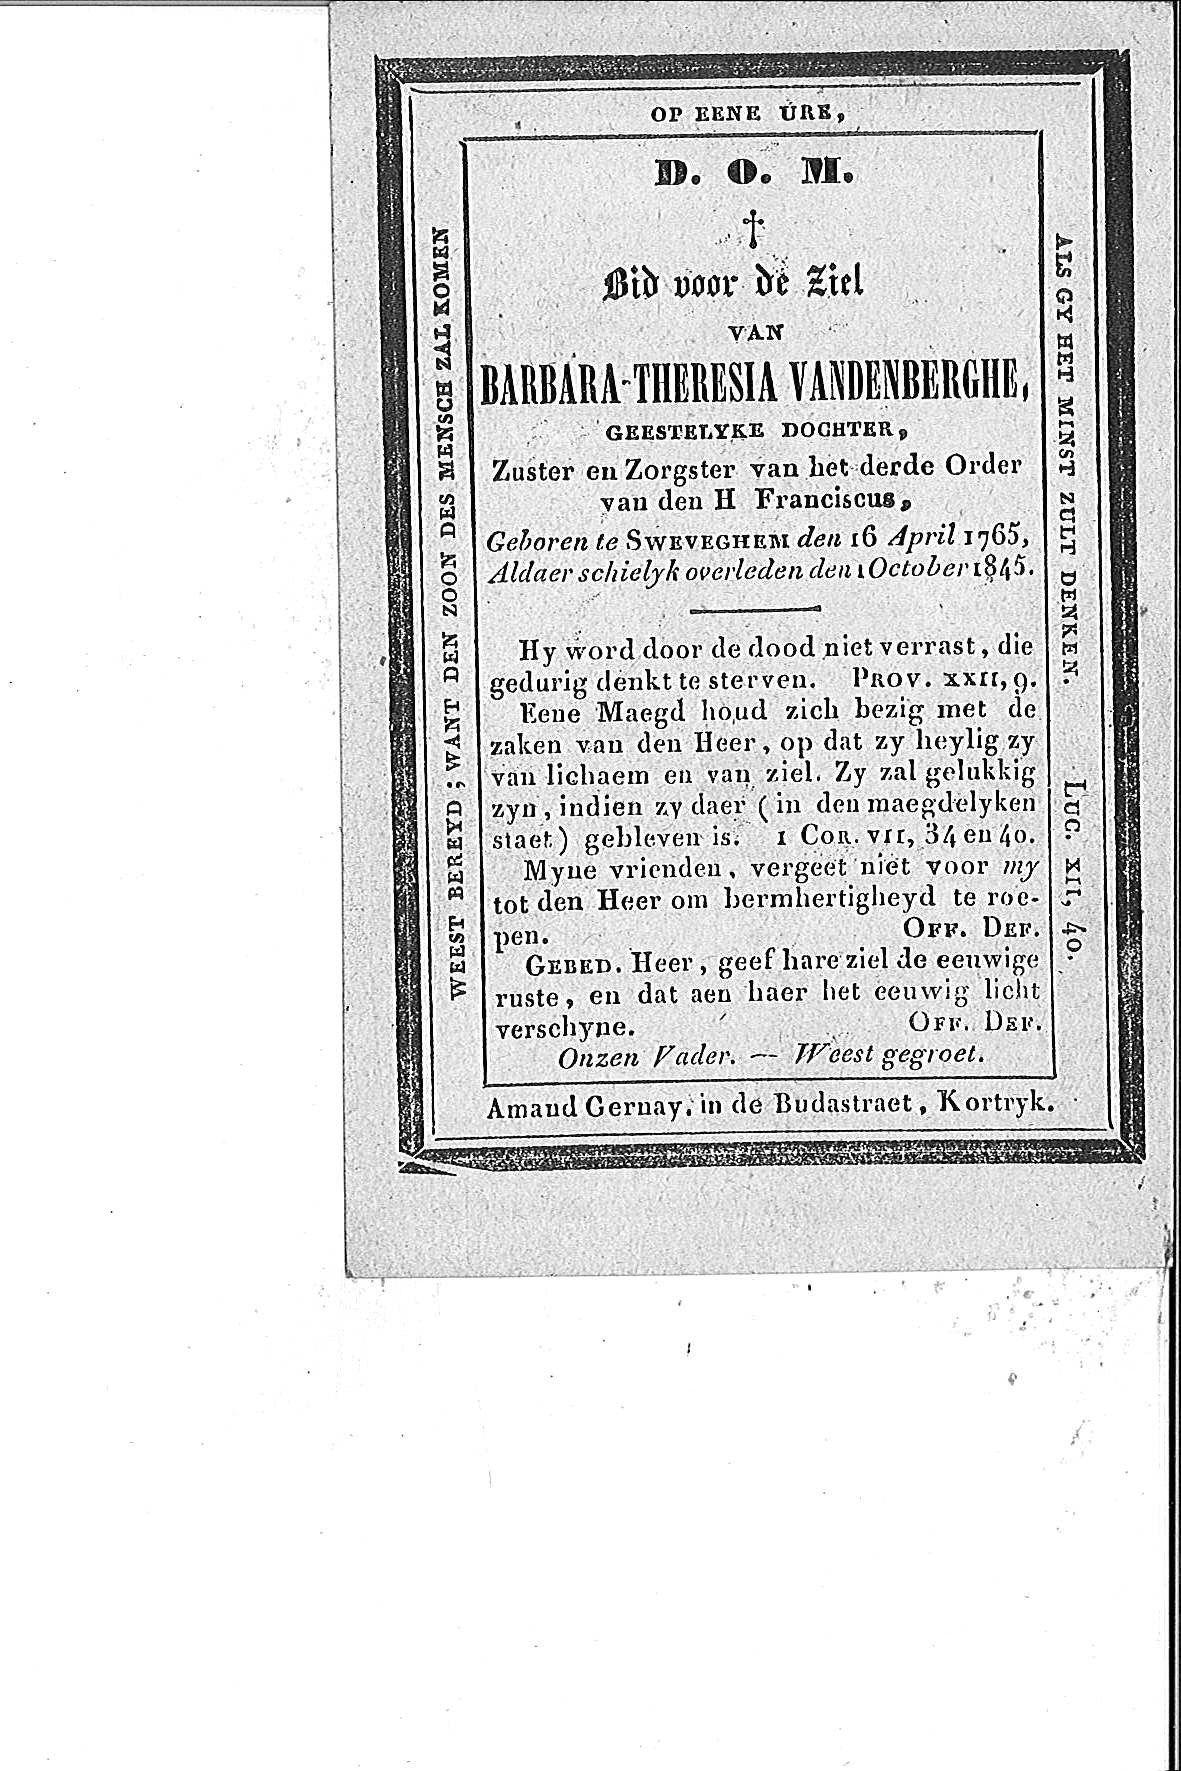 Barbara_Theresia(1845)20150731132931_00096.jpg